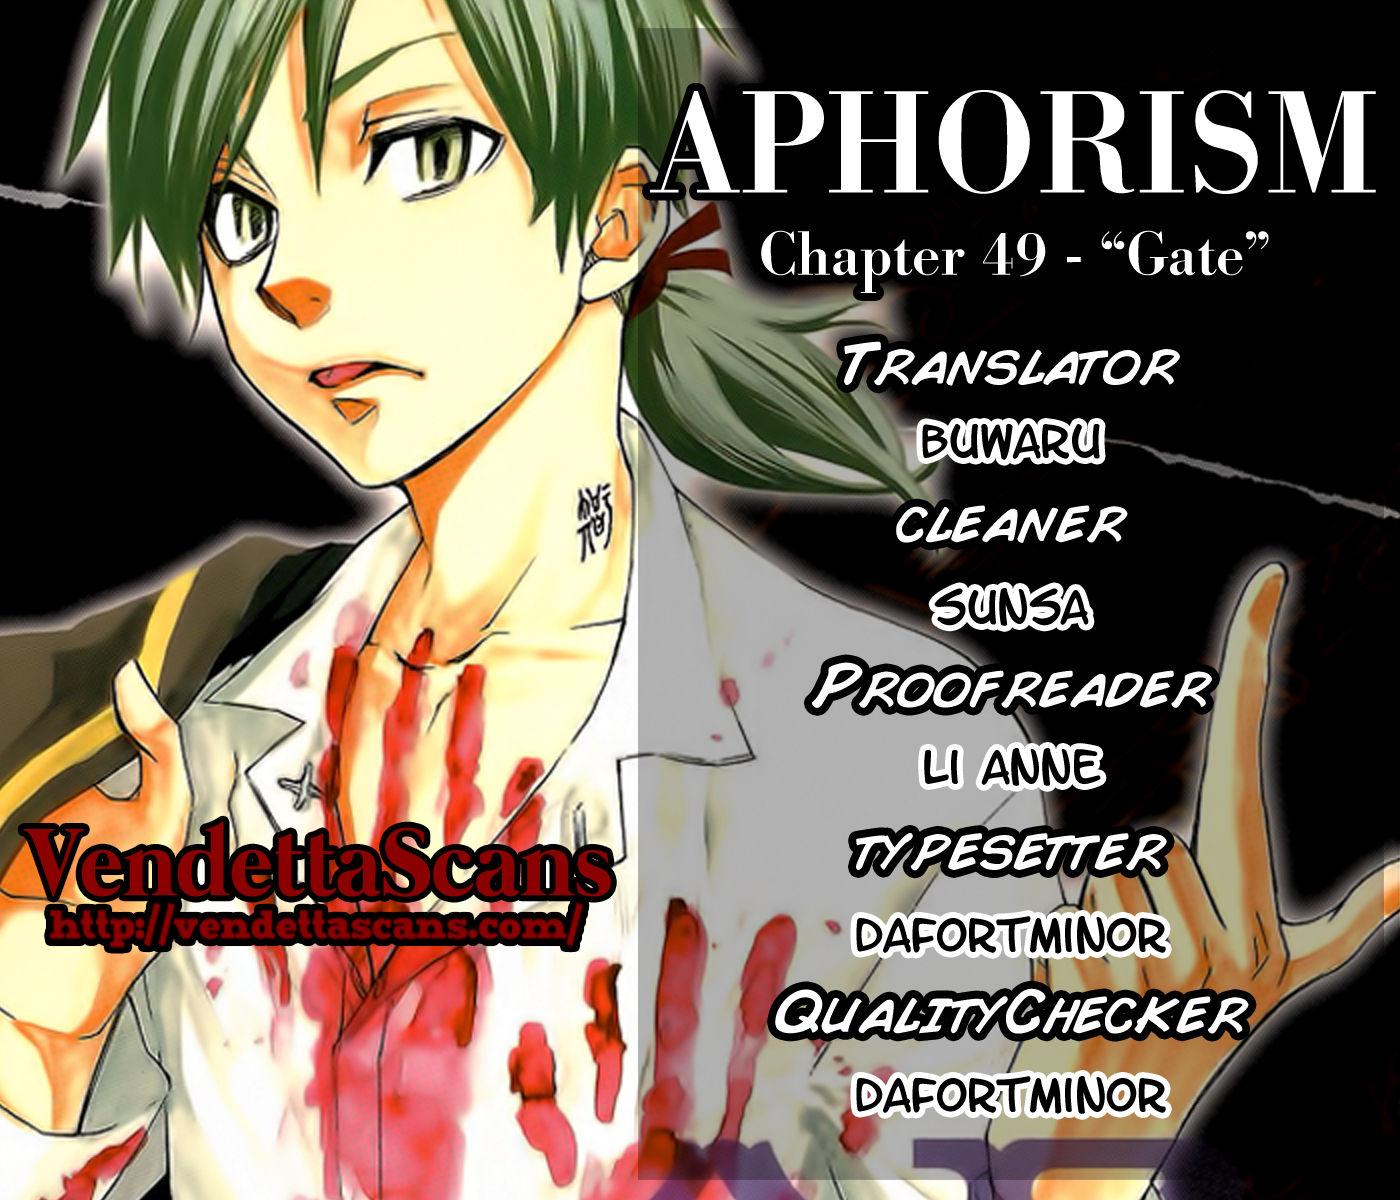 Aphorism 49 Page 1